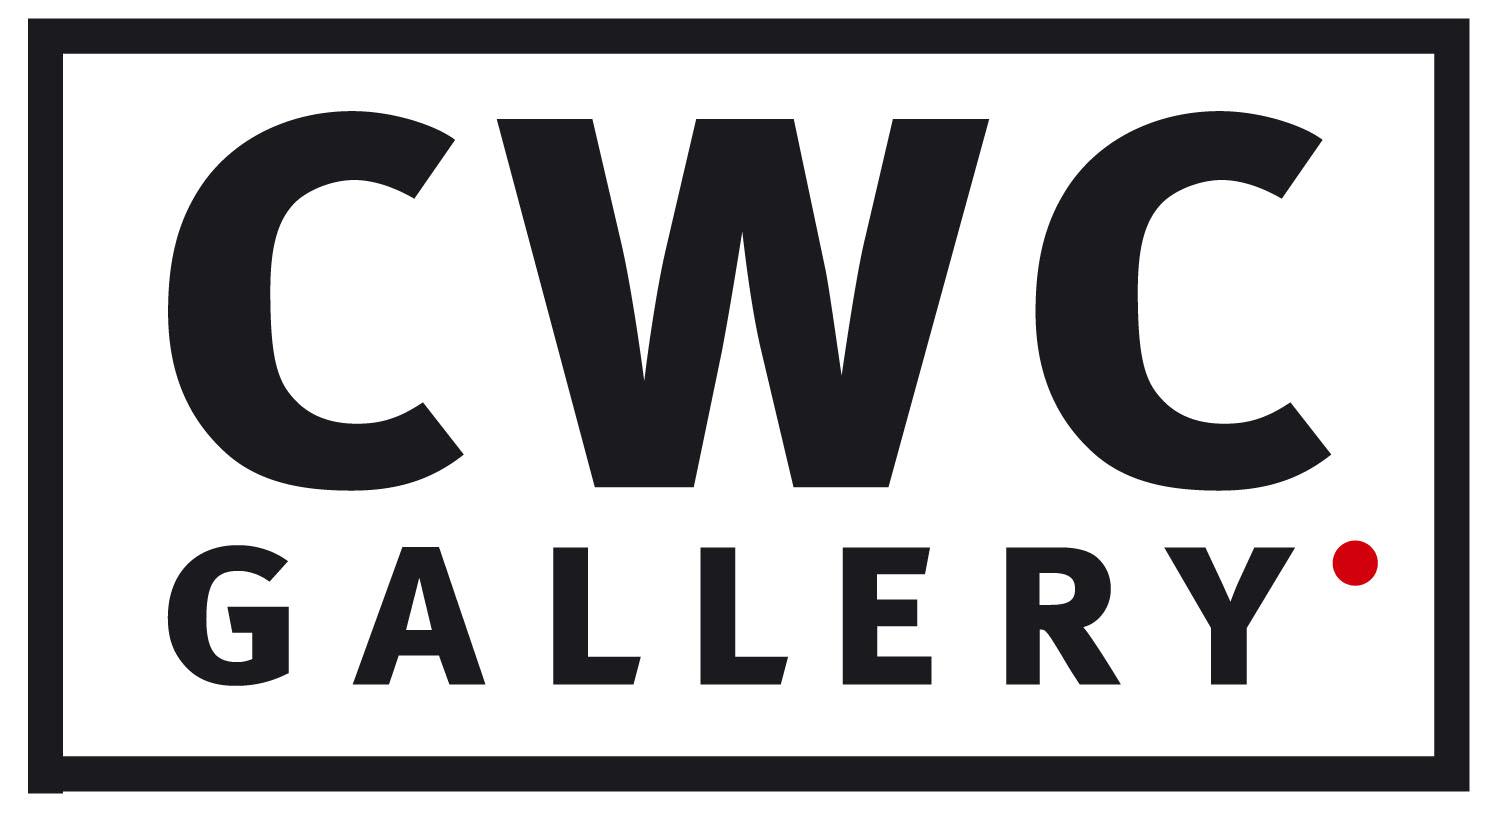 Logo CWC Gallery